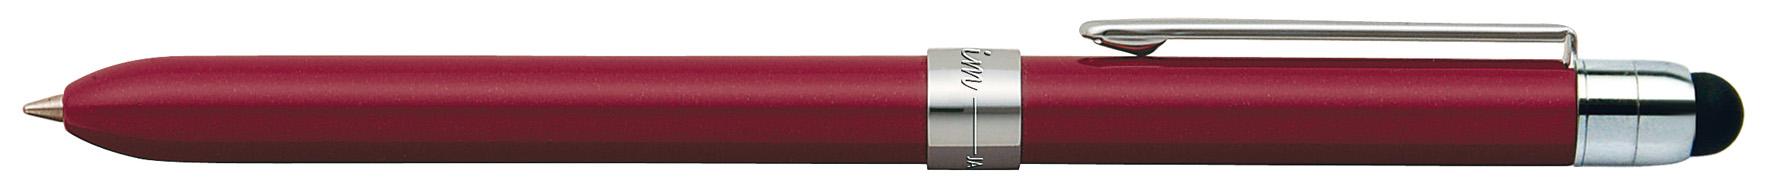 Pix Multifunctional De Lux Penac Slim Touch  In Cutie Cadou  Corp Bordeaux - Accesorii Argintii